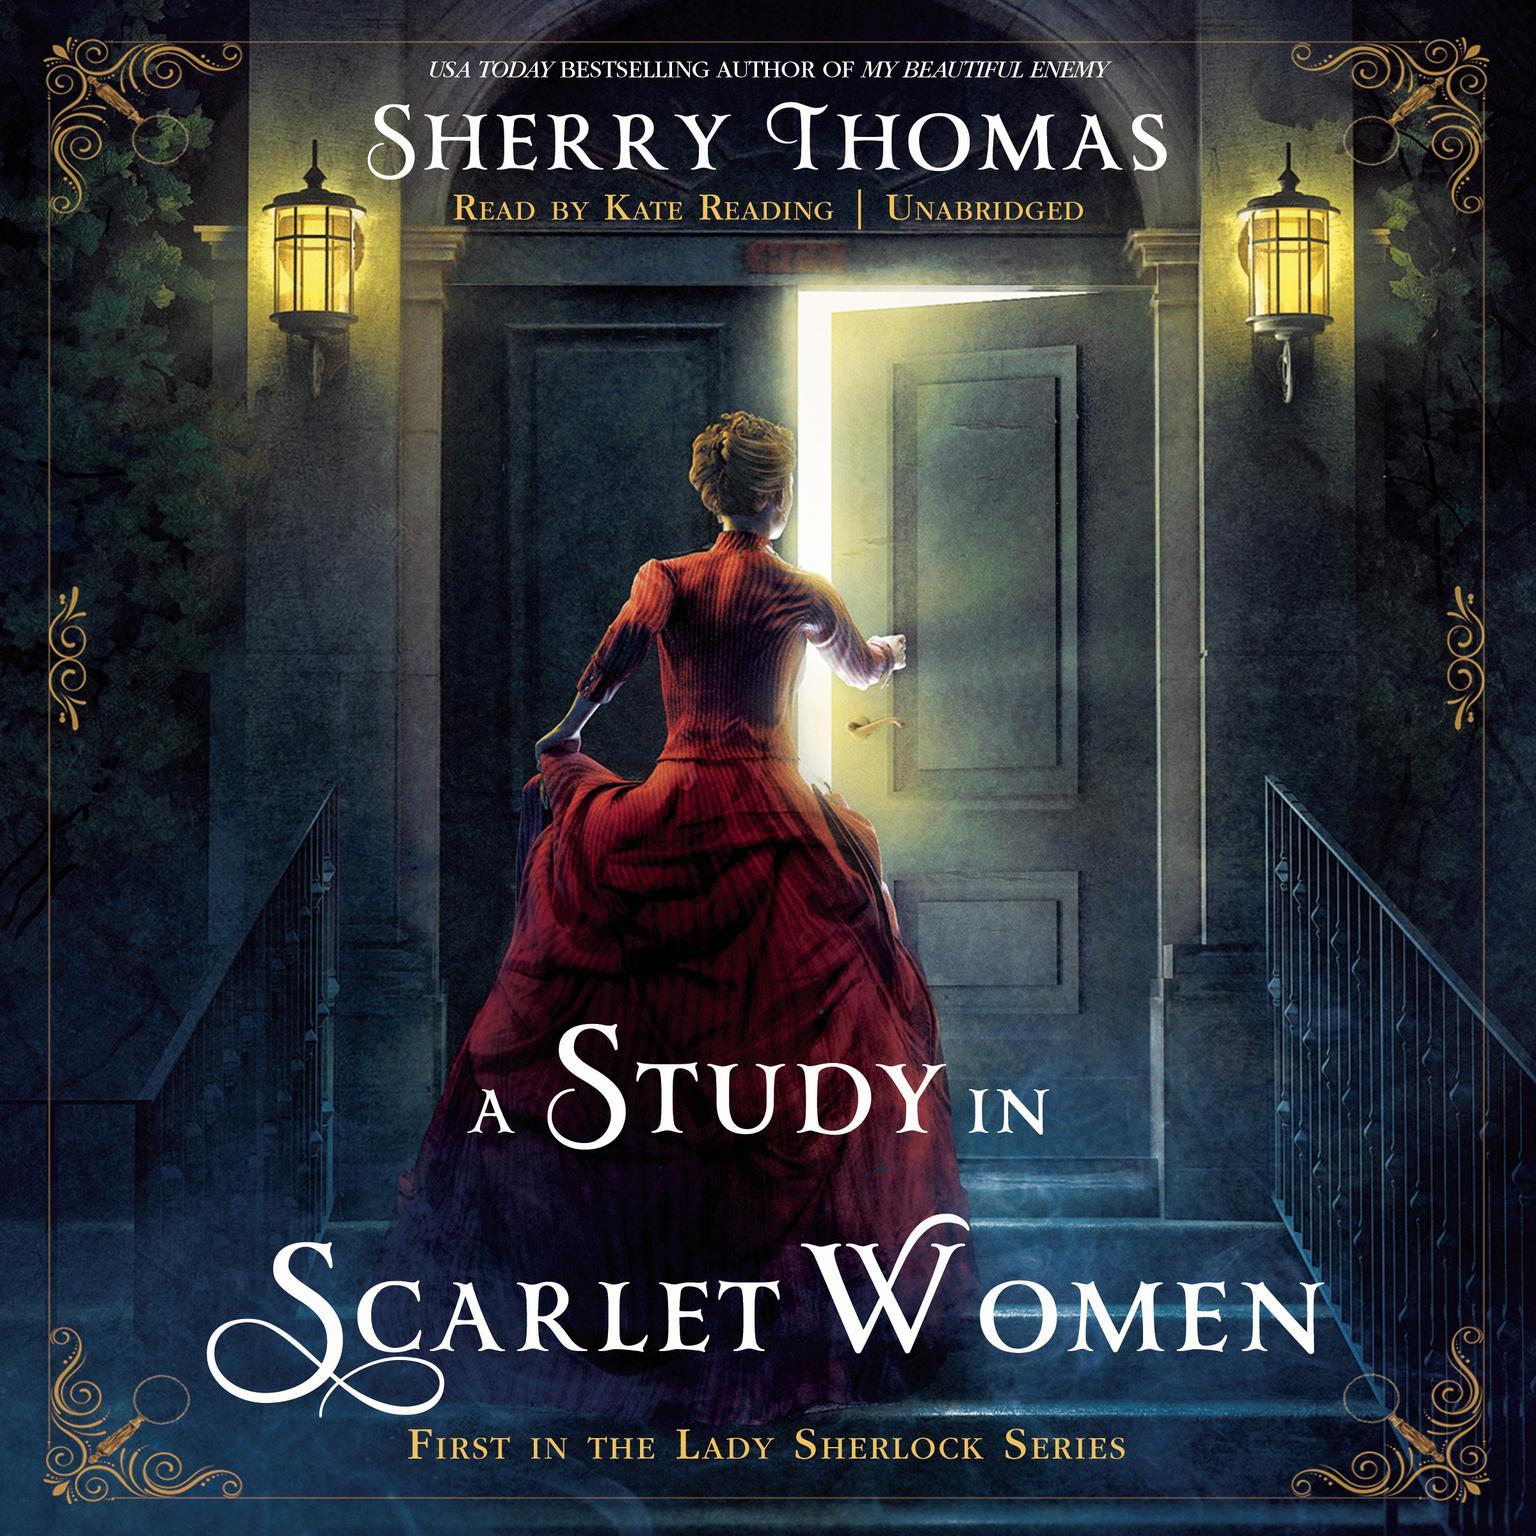 A Study in Scarlet Women Audiobook